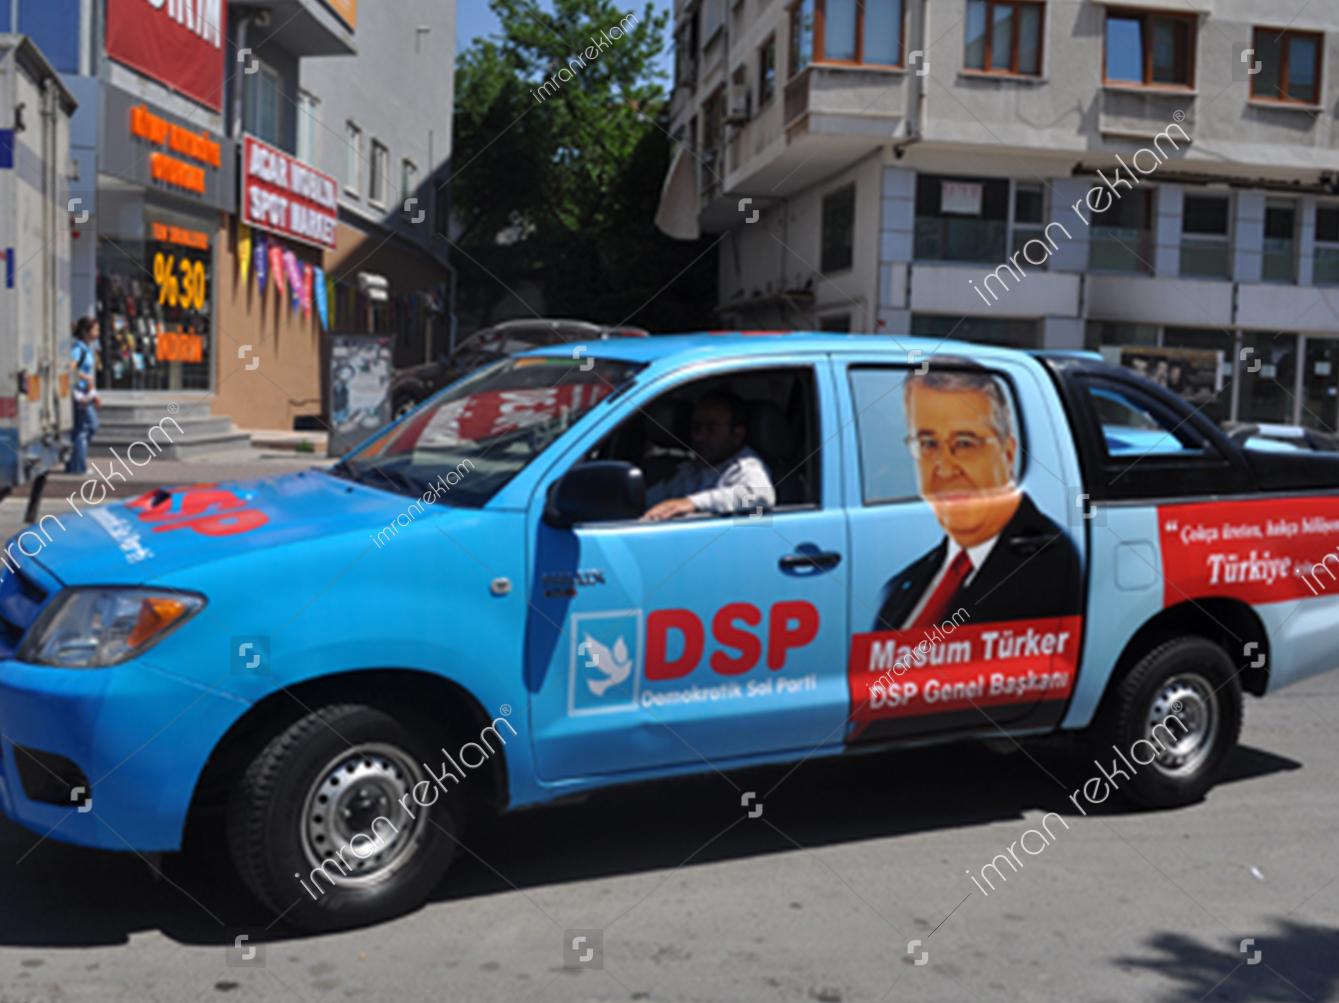 dsp-parti-arac-jeep-giydirme